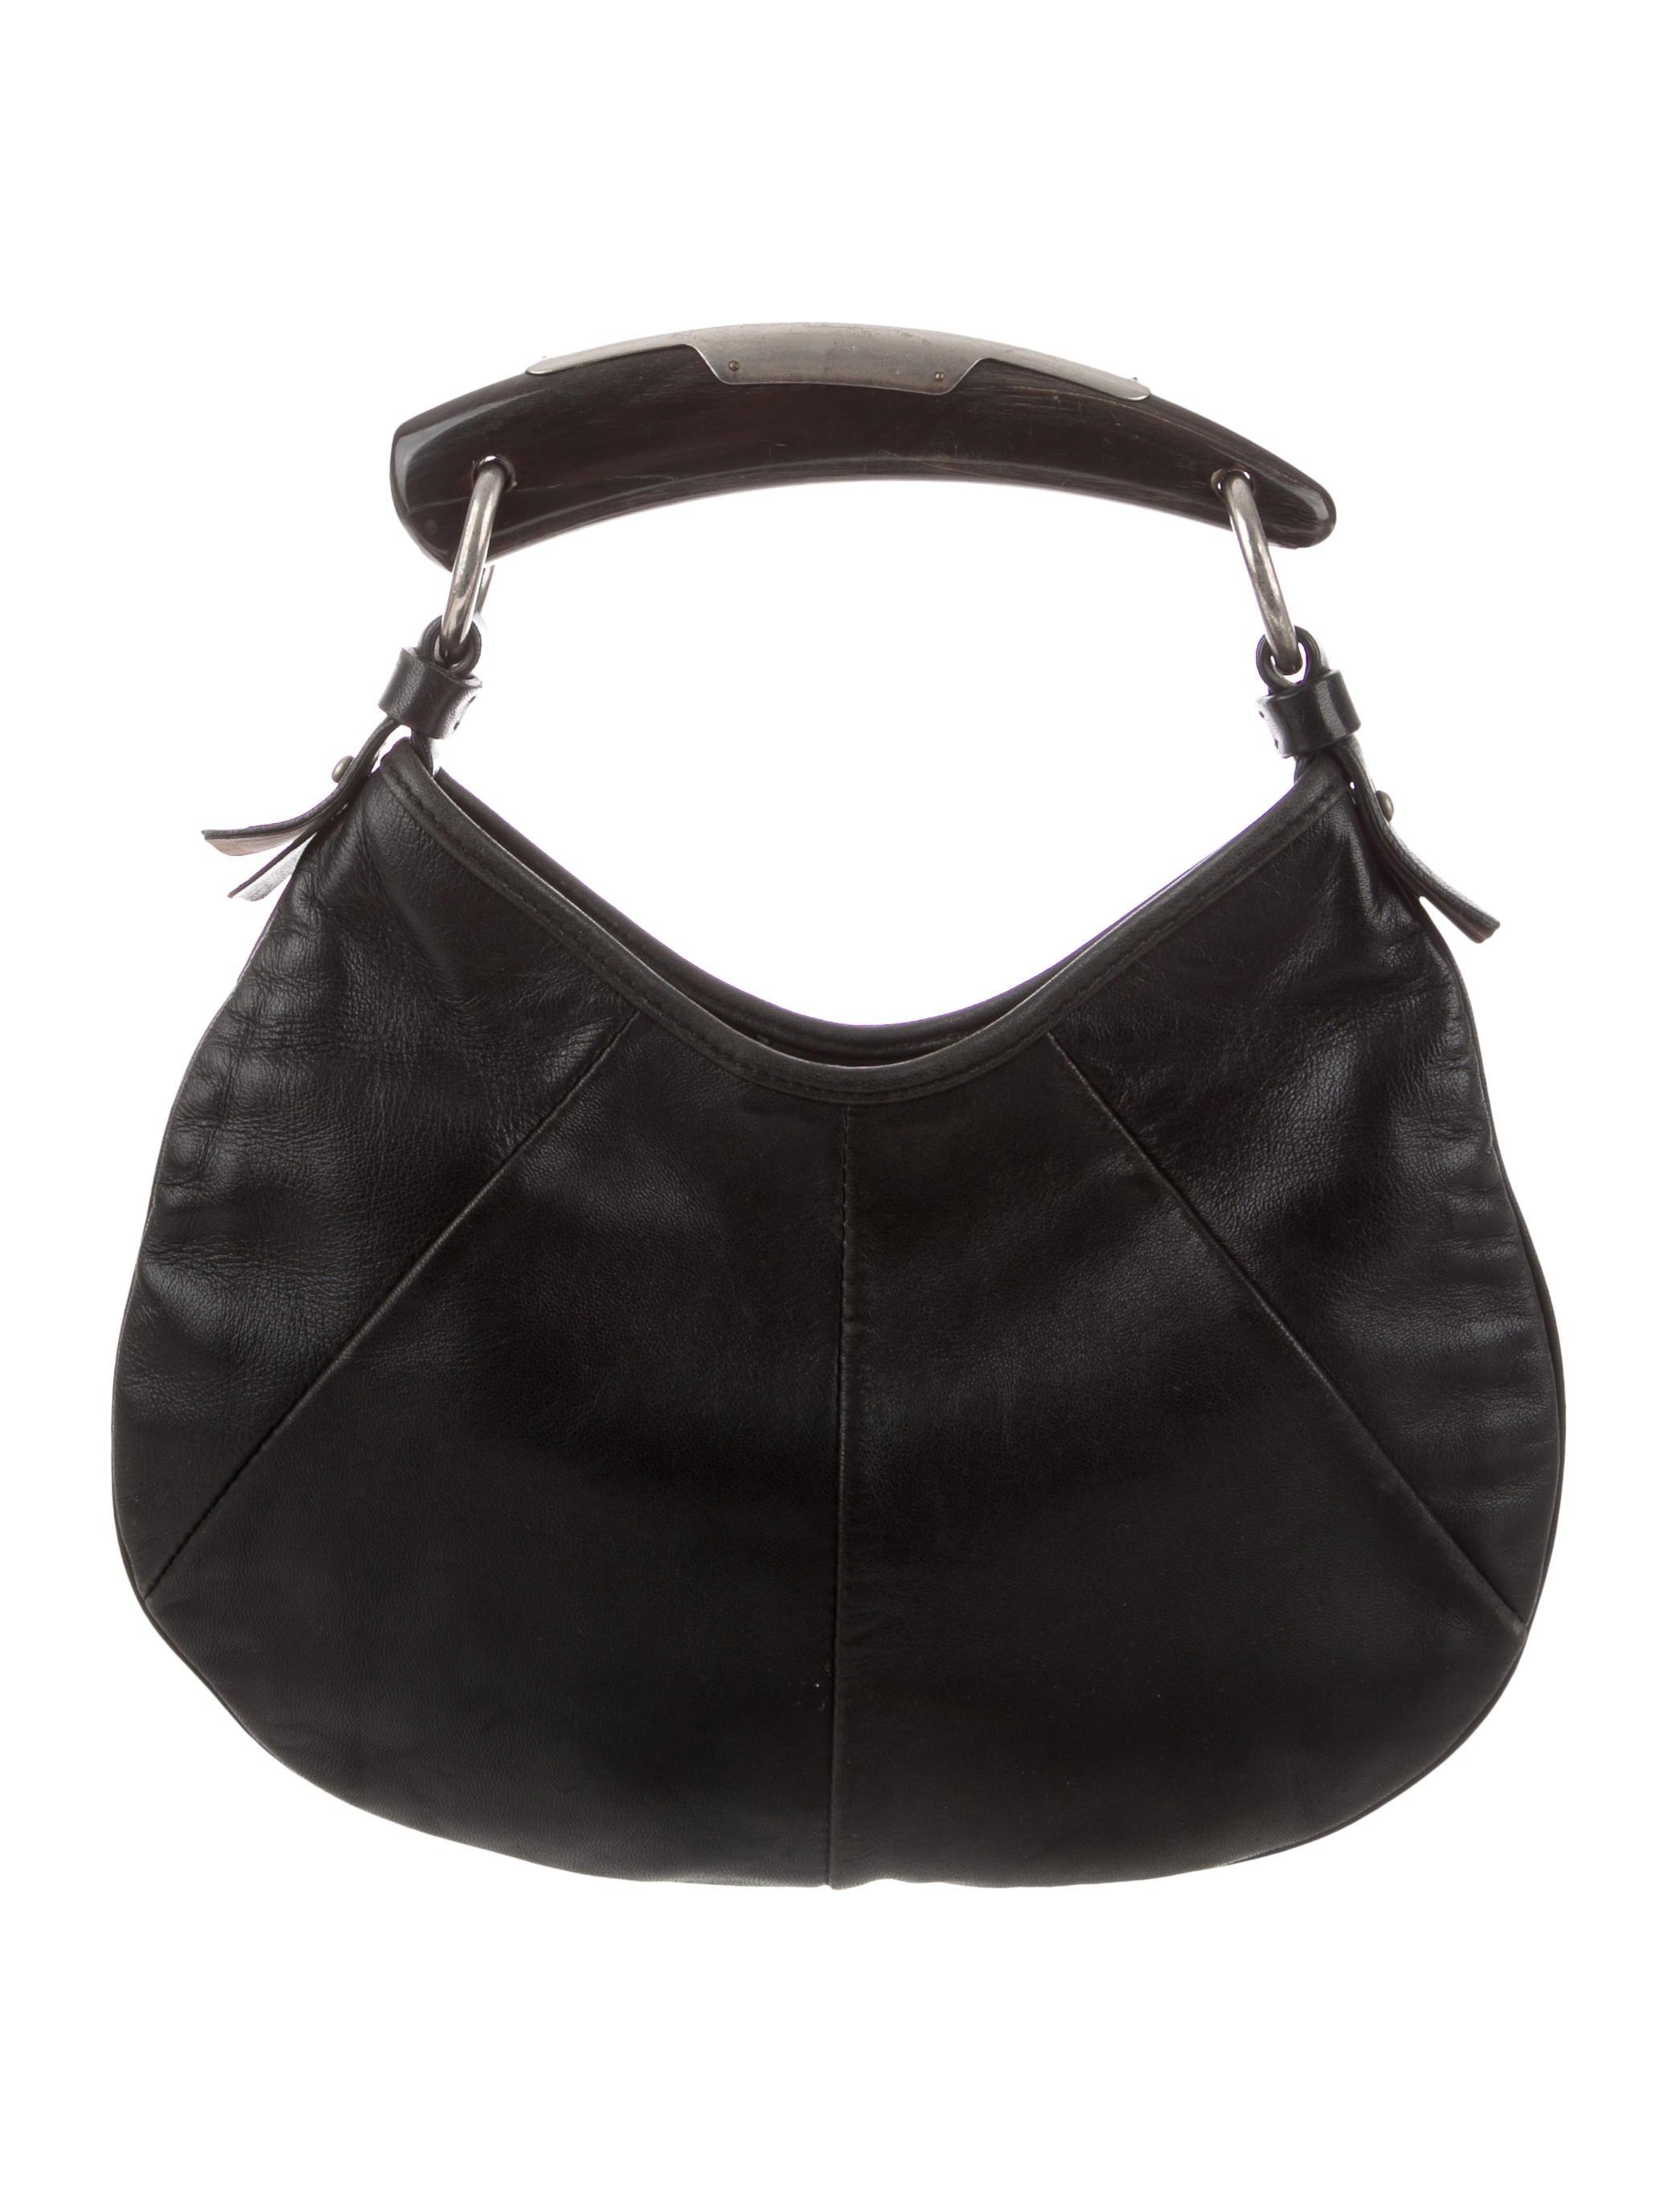 b6352b8cacc9 Yves Saint Laurent Mini Mombasa Bag - Handbags - YVE96910